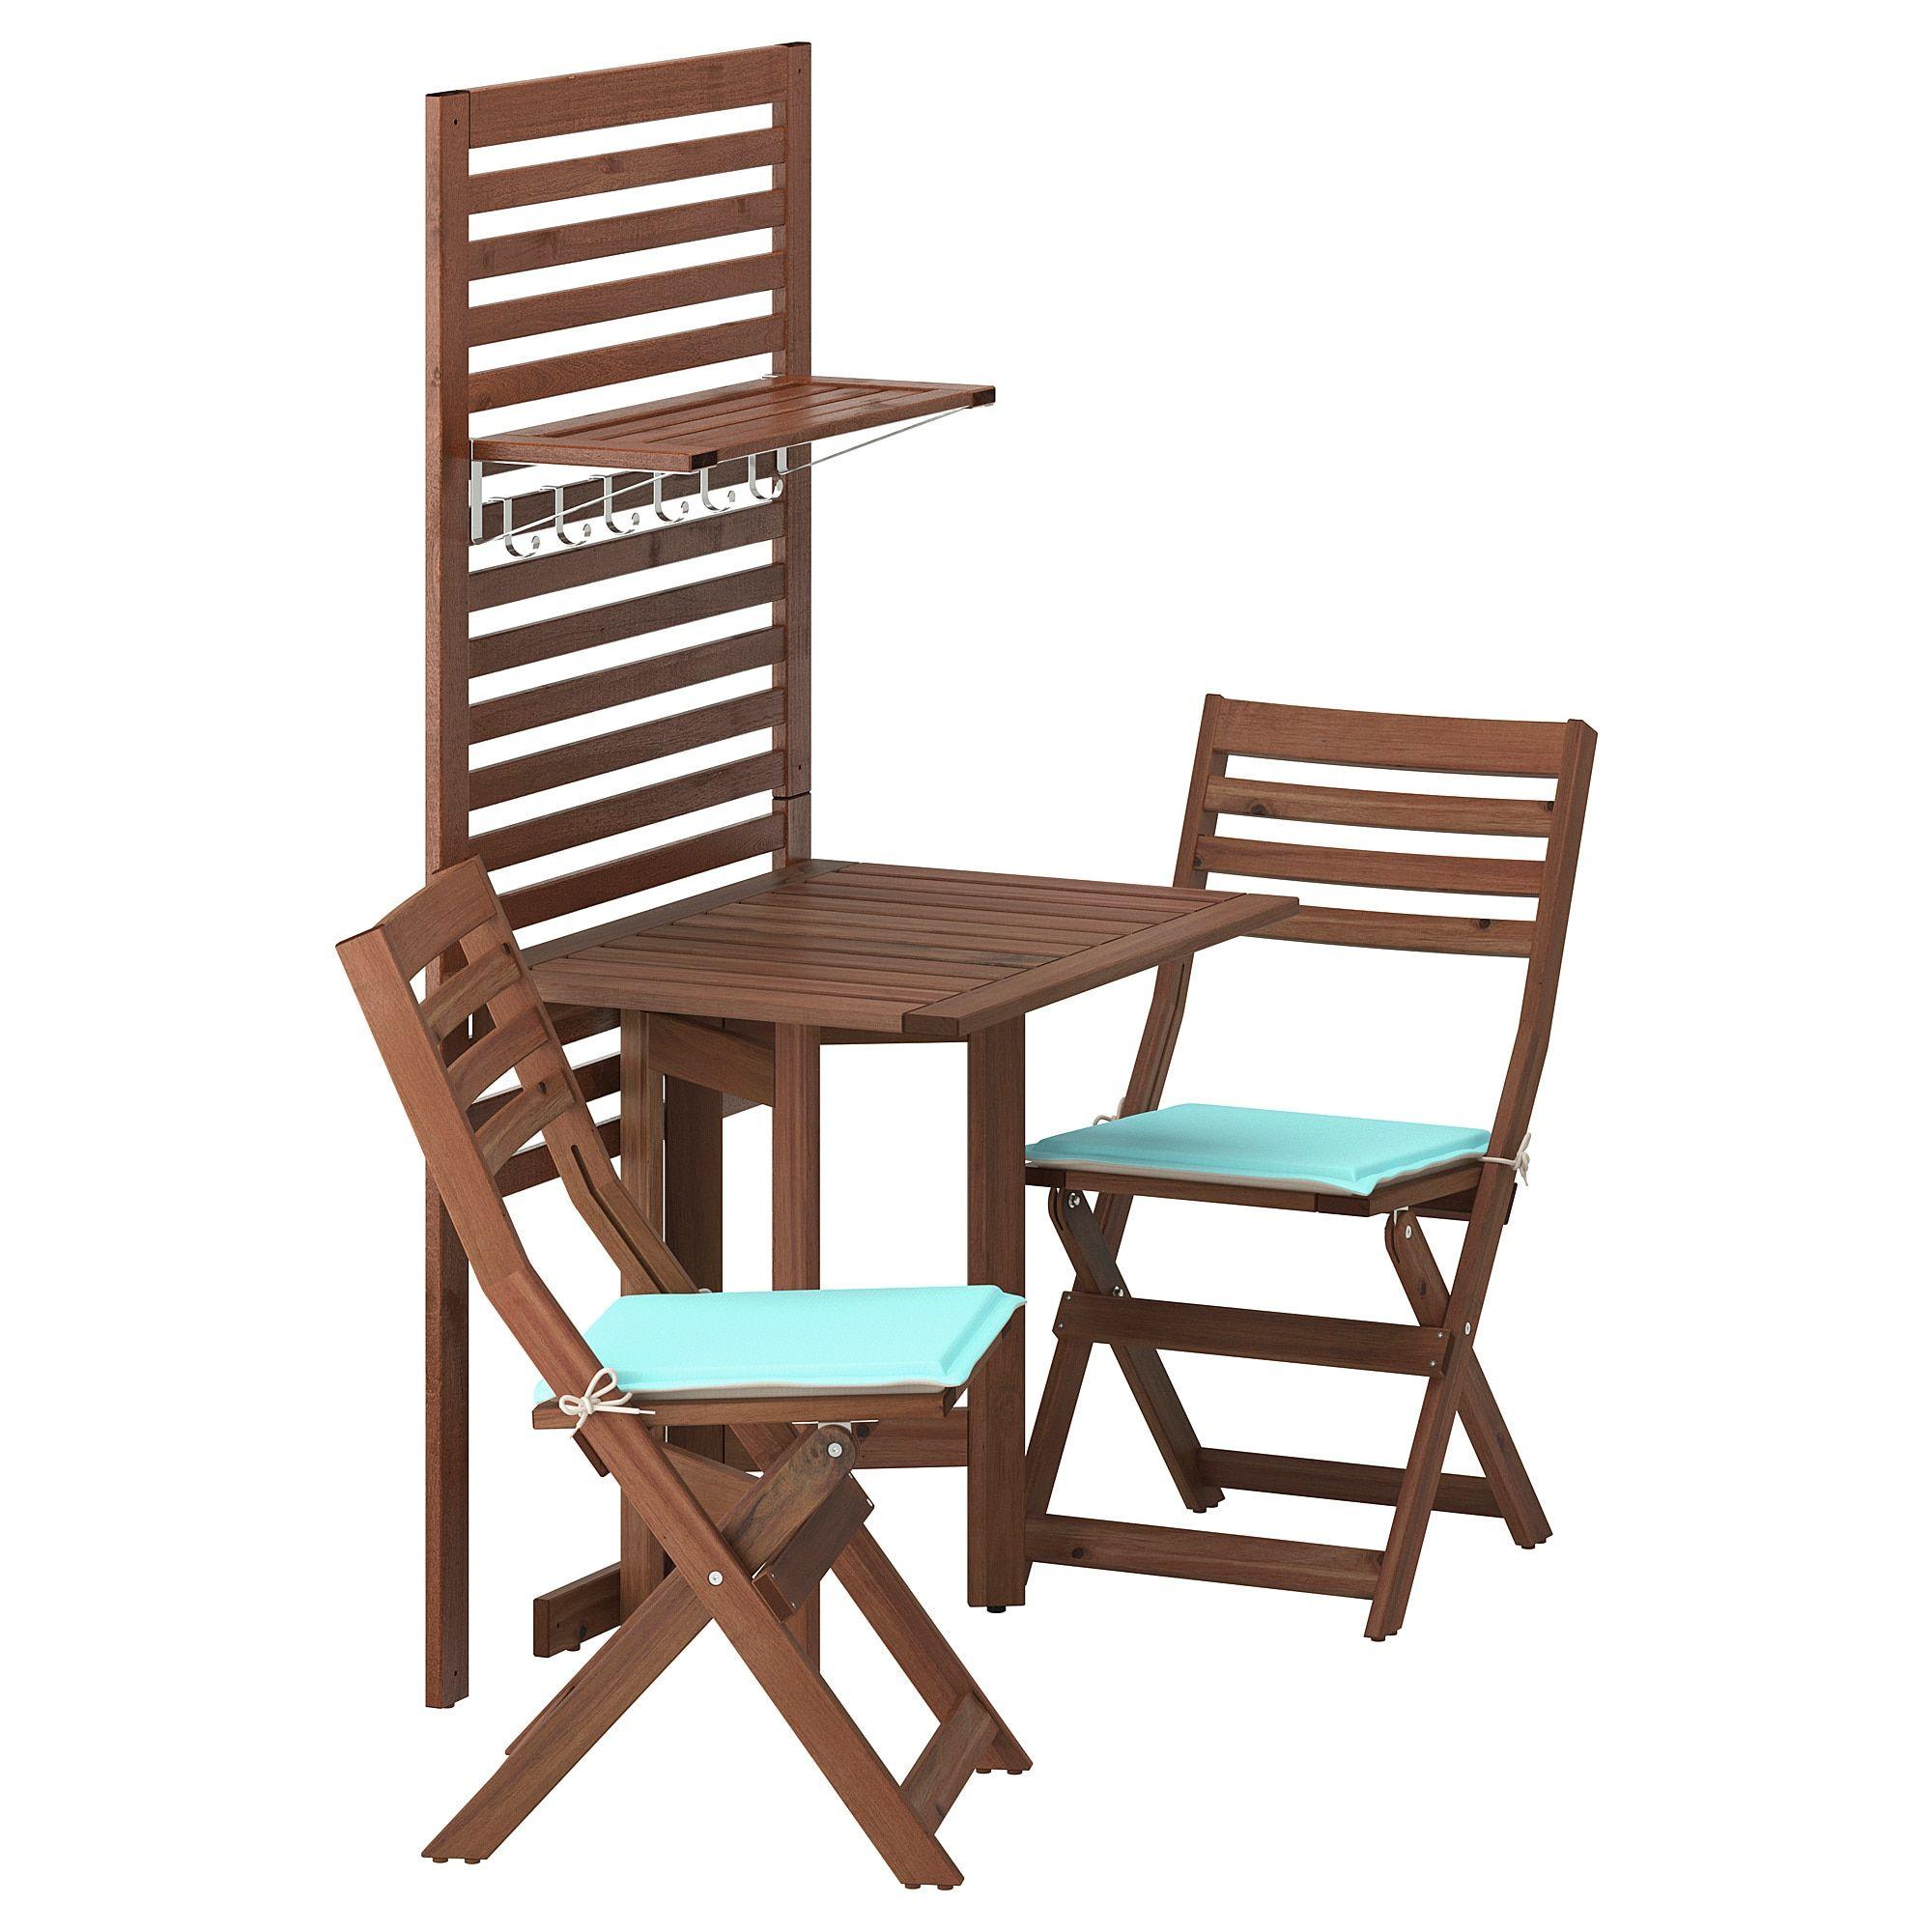 Australia Ikea outdoor, Outdoor dining furniture